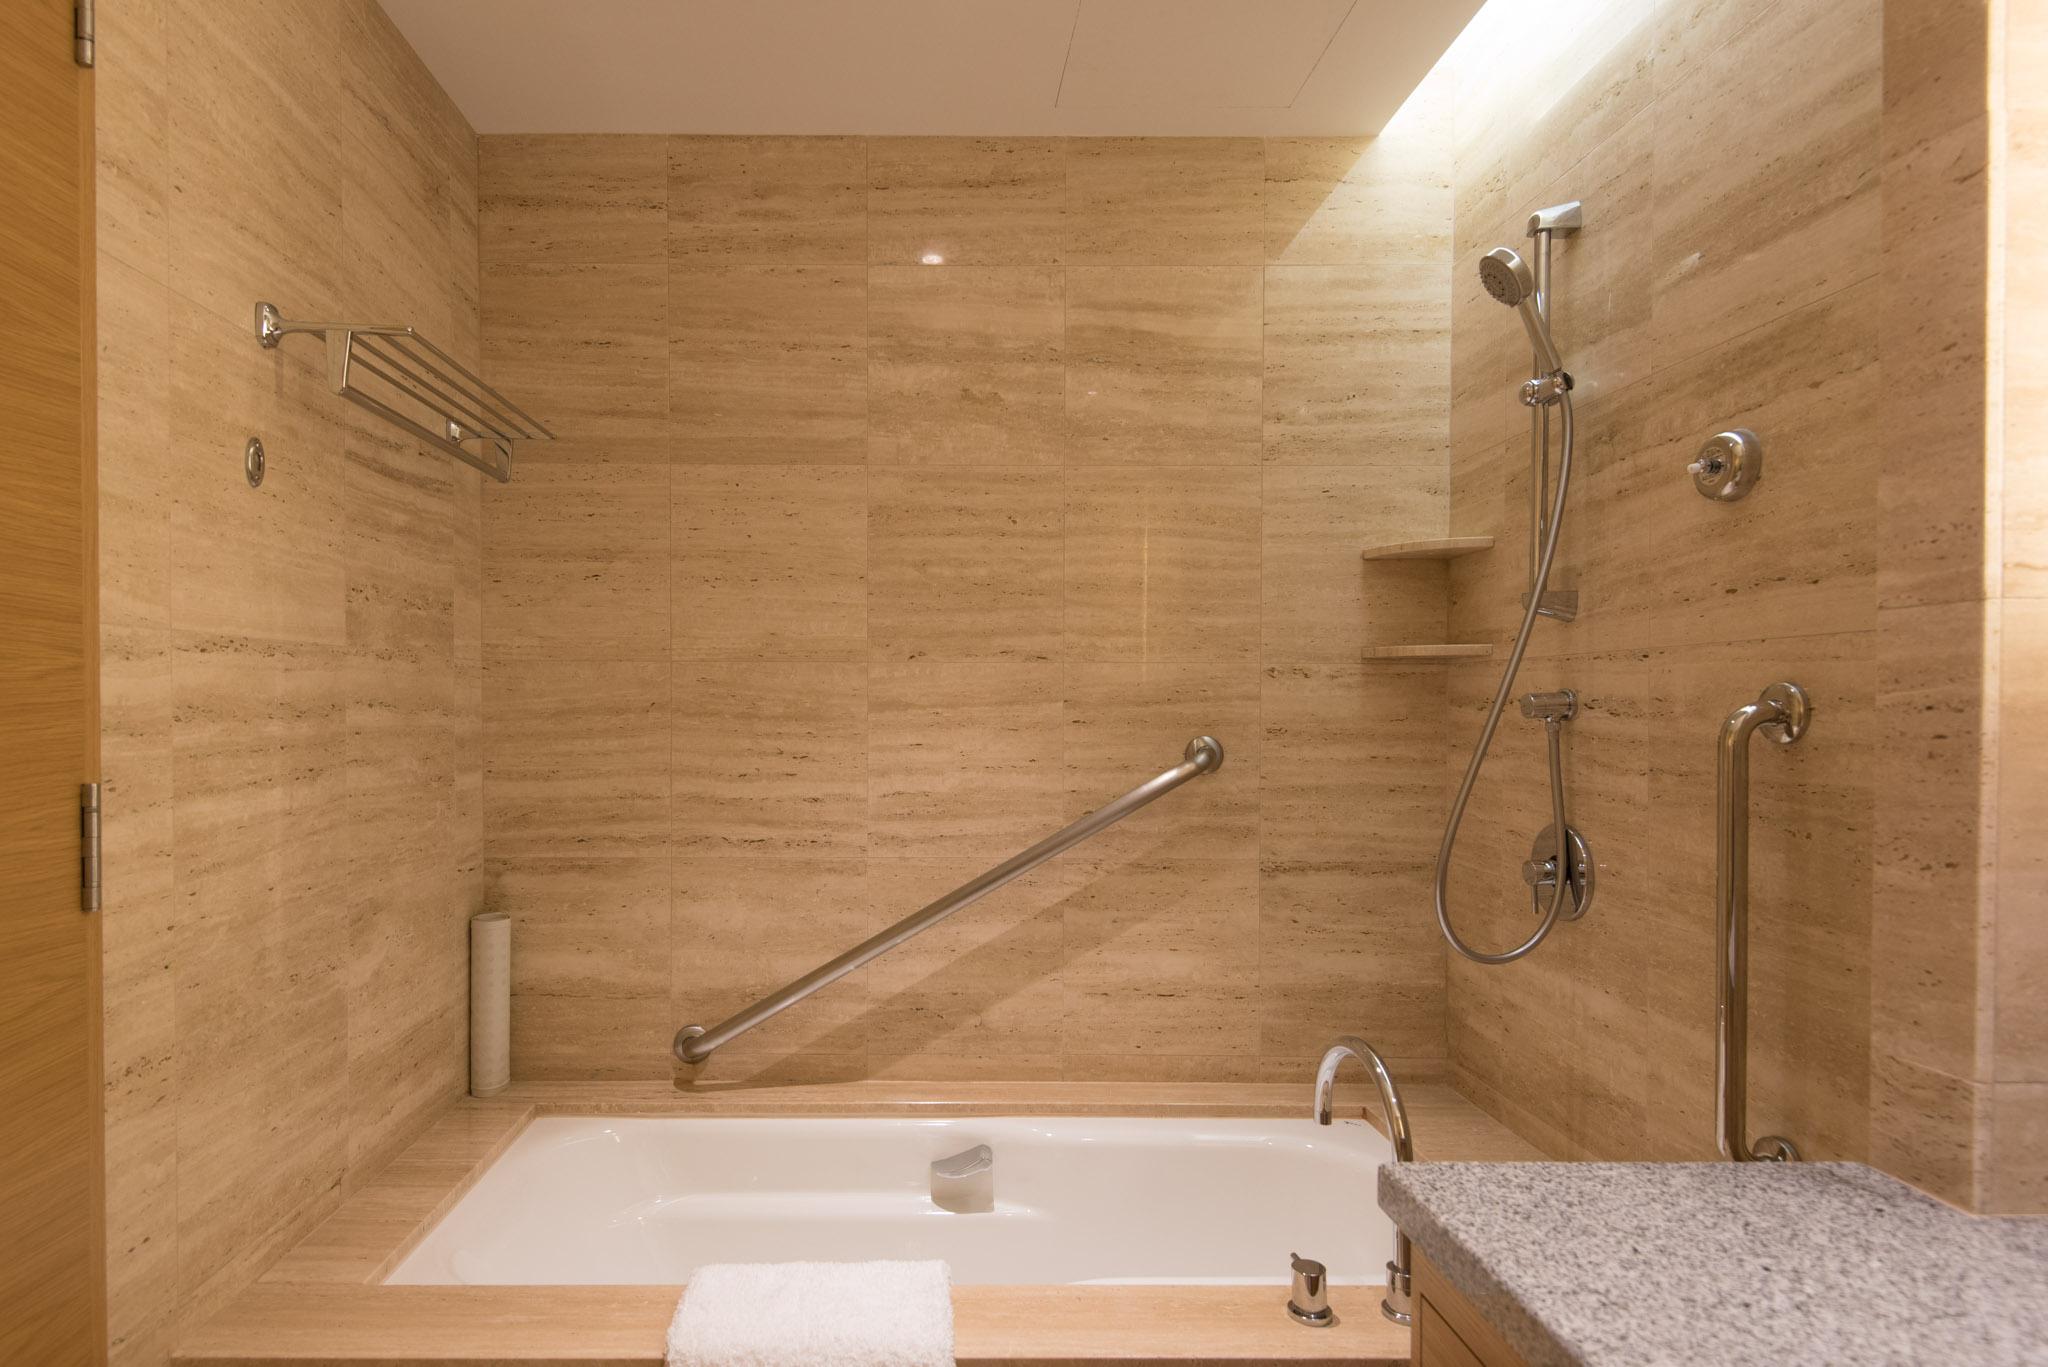 Deluxe Room Bathroom - Hotel Jen Orchardgateway Singapore